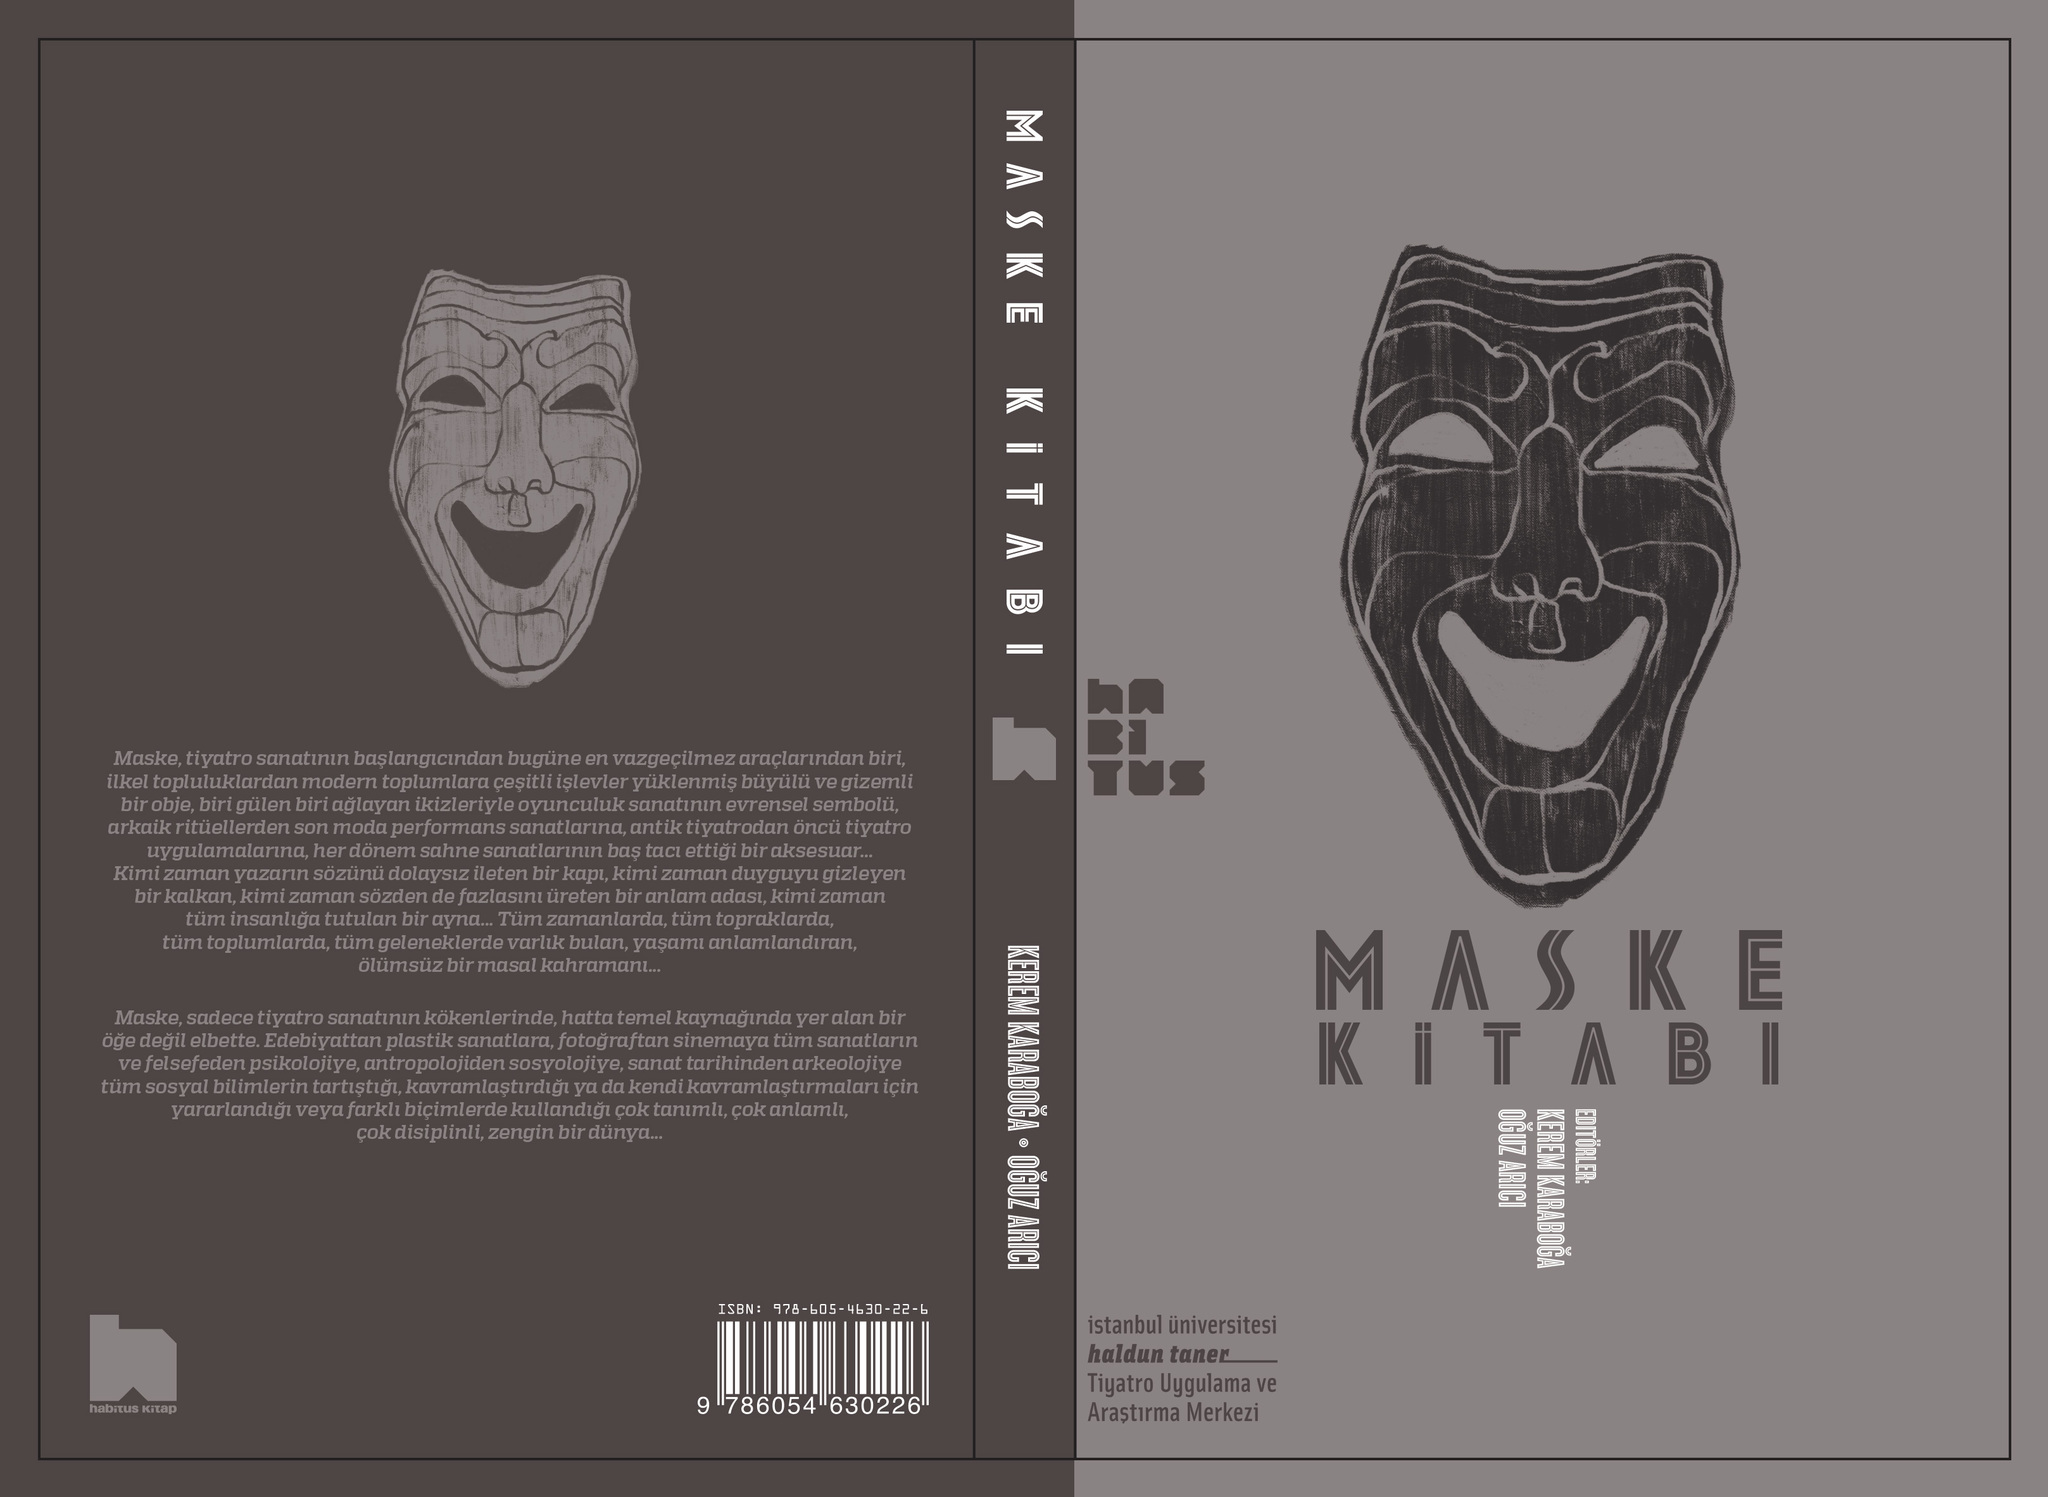 Maske Kitap Kapağı